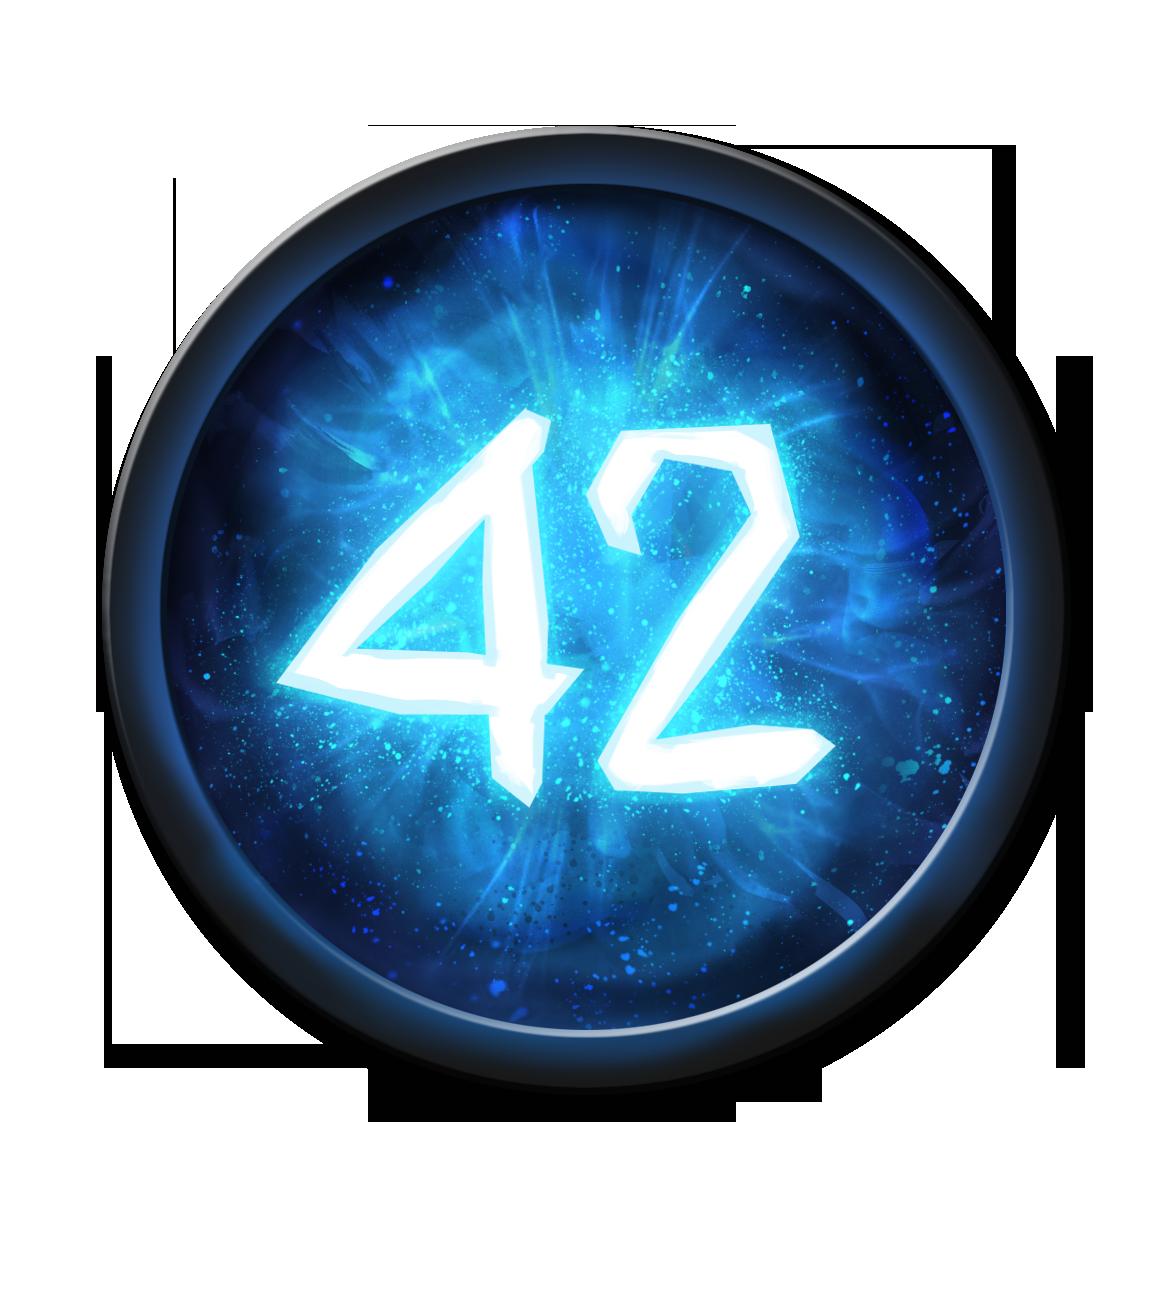 Perfection42's logo